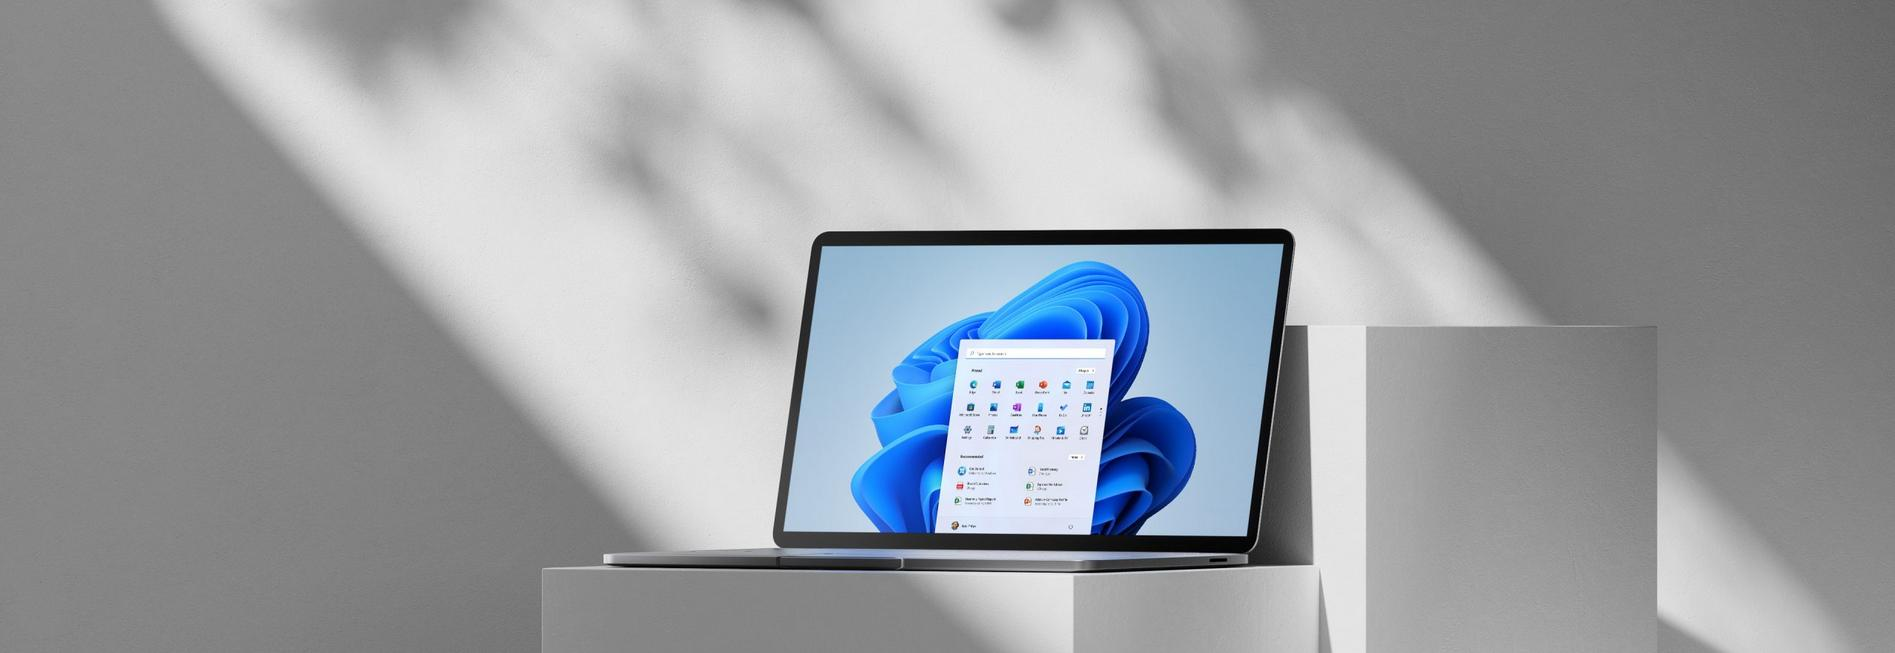 Windows 11 - Nowosciproduktowe.pl